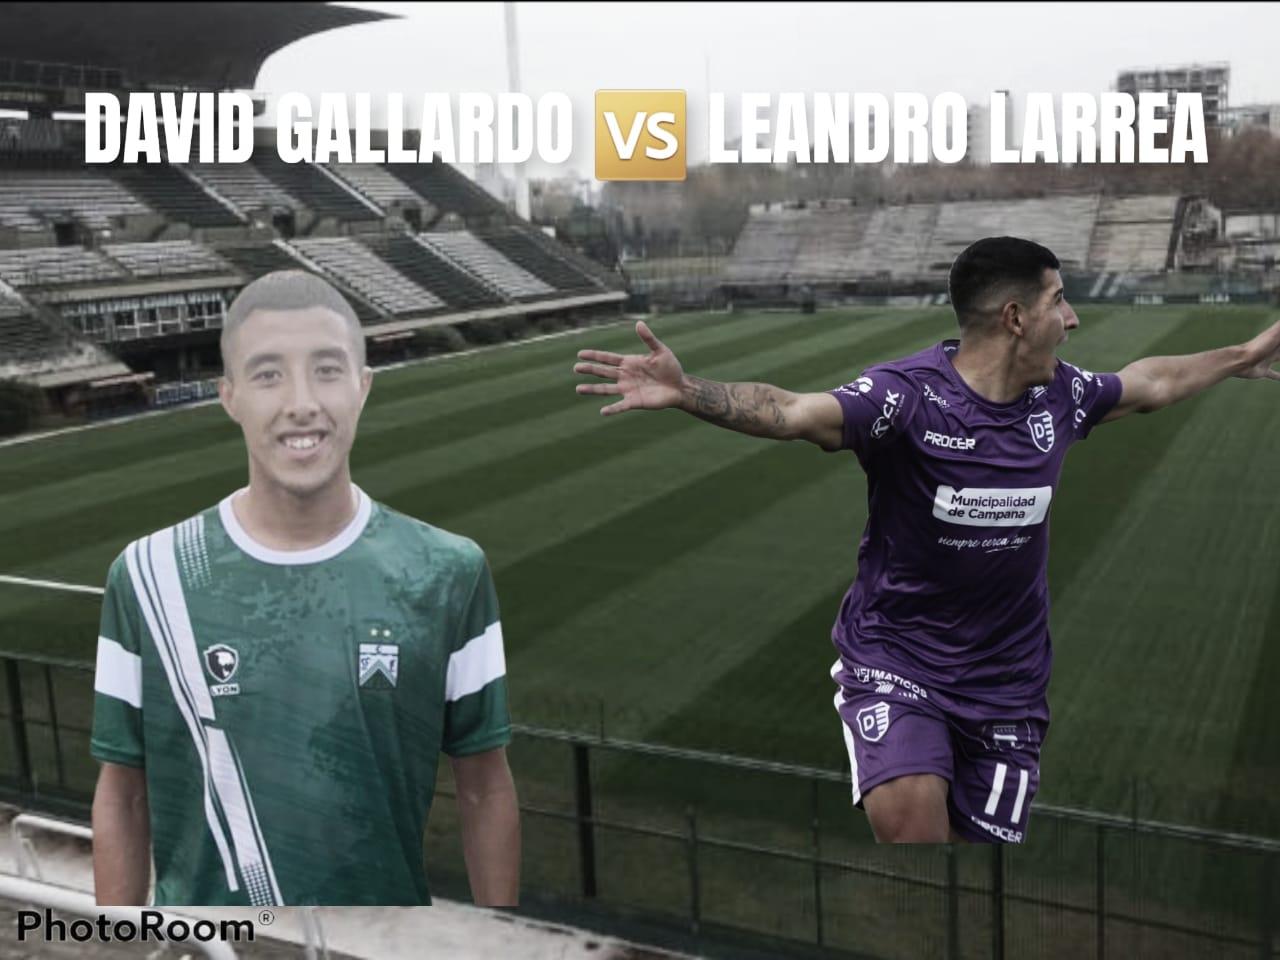 David Gallardo vs Leandro Larrea: Volantes que pisan el área